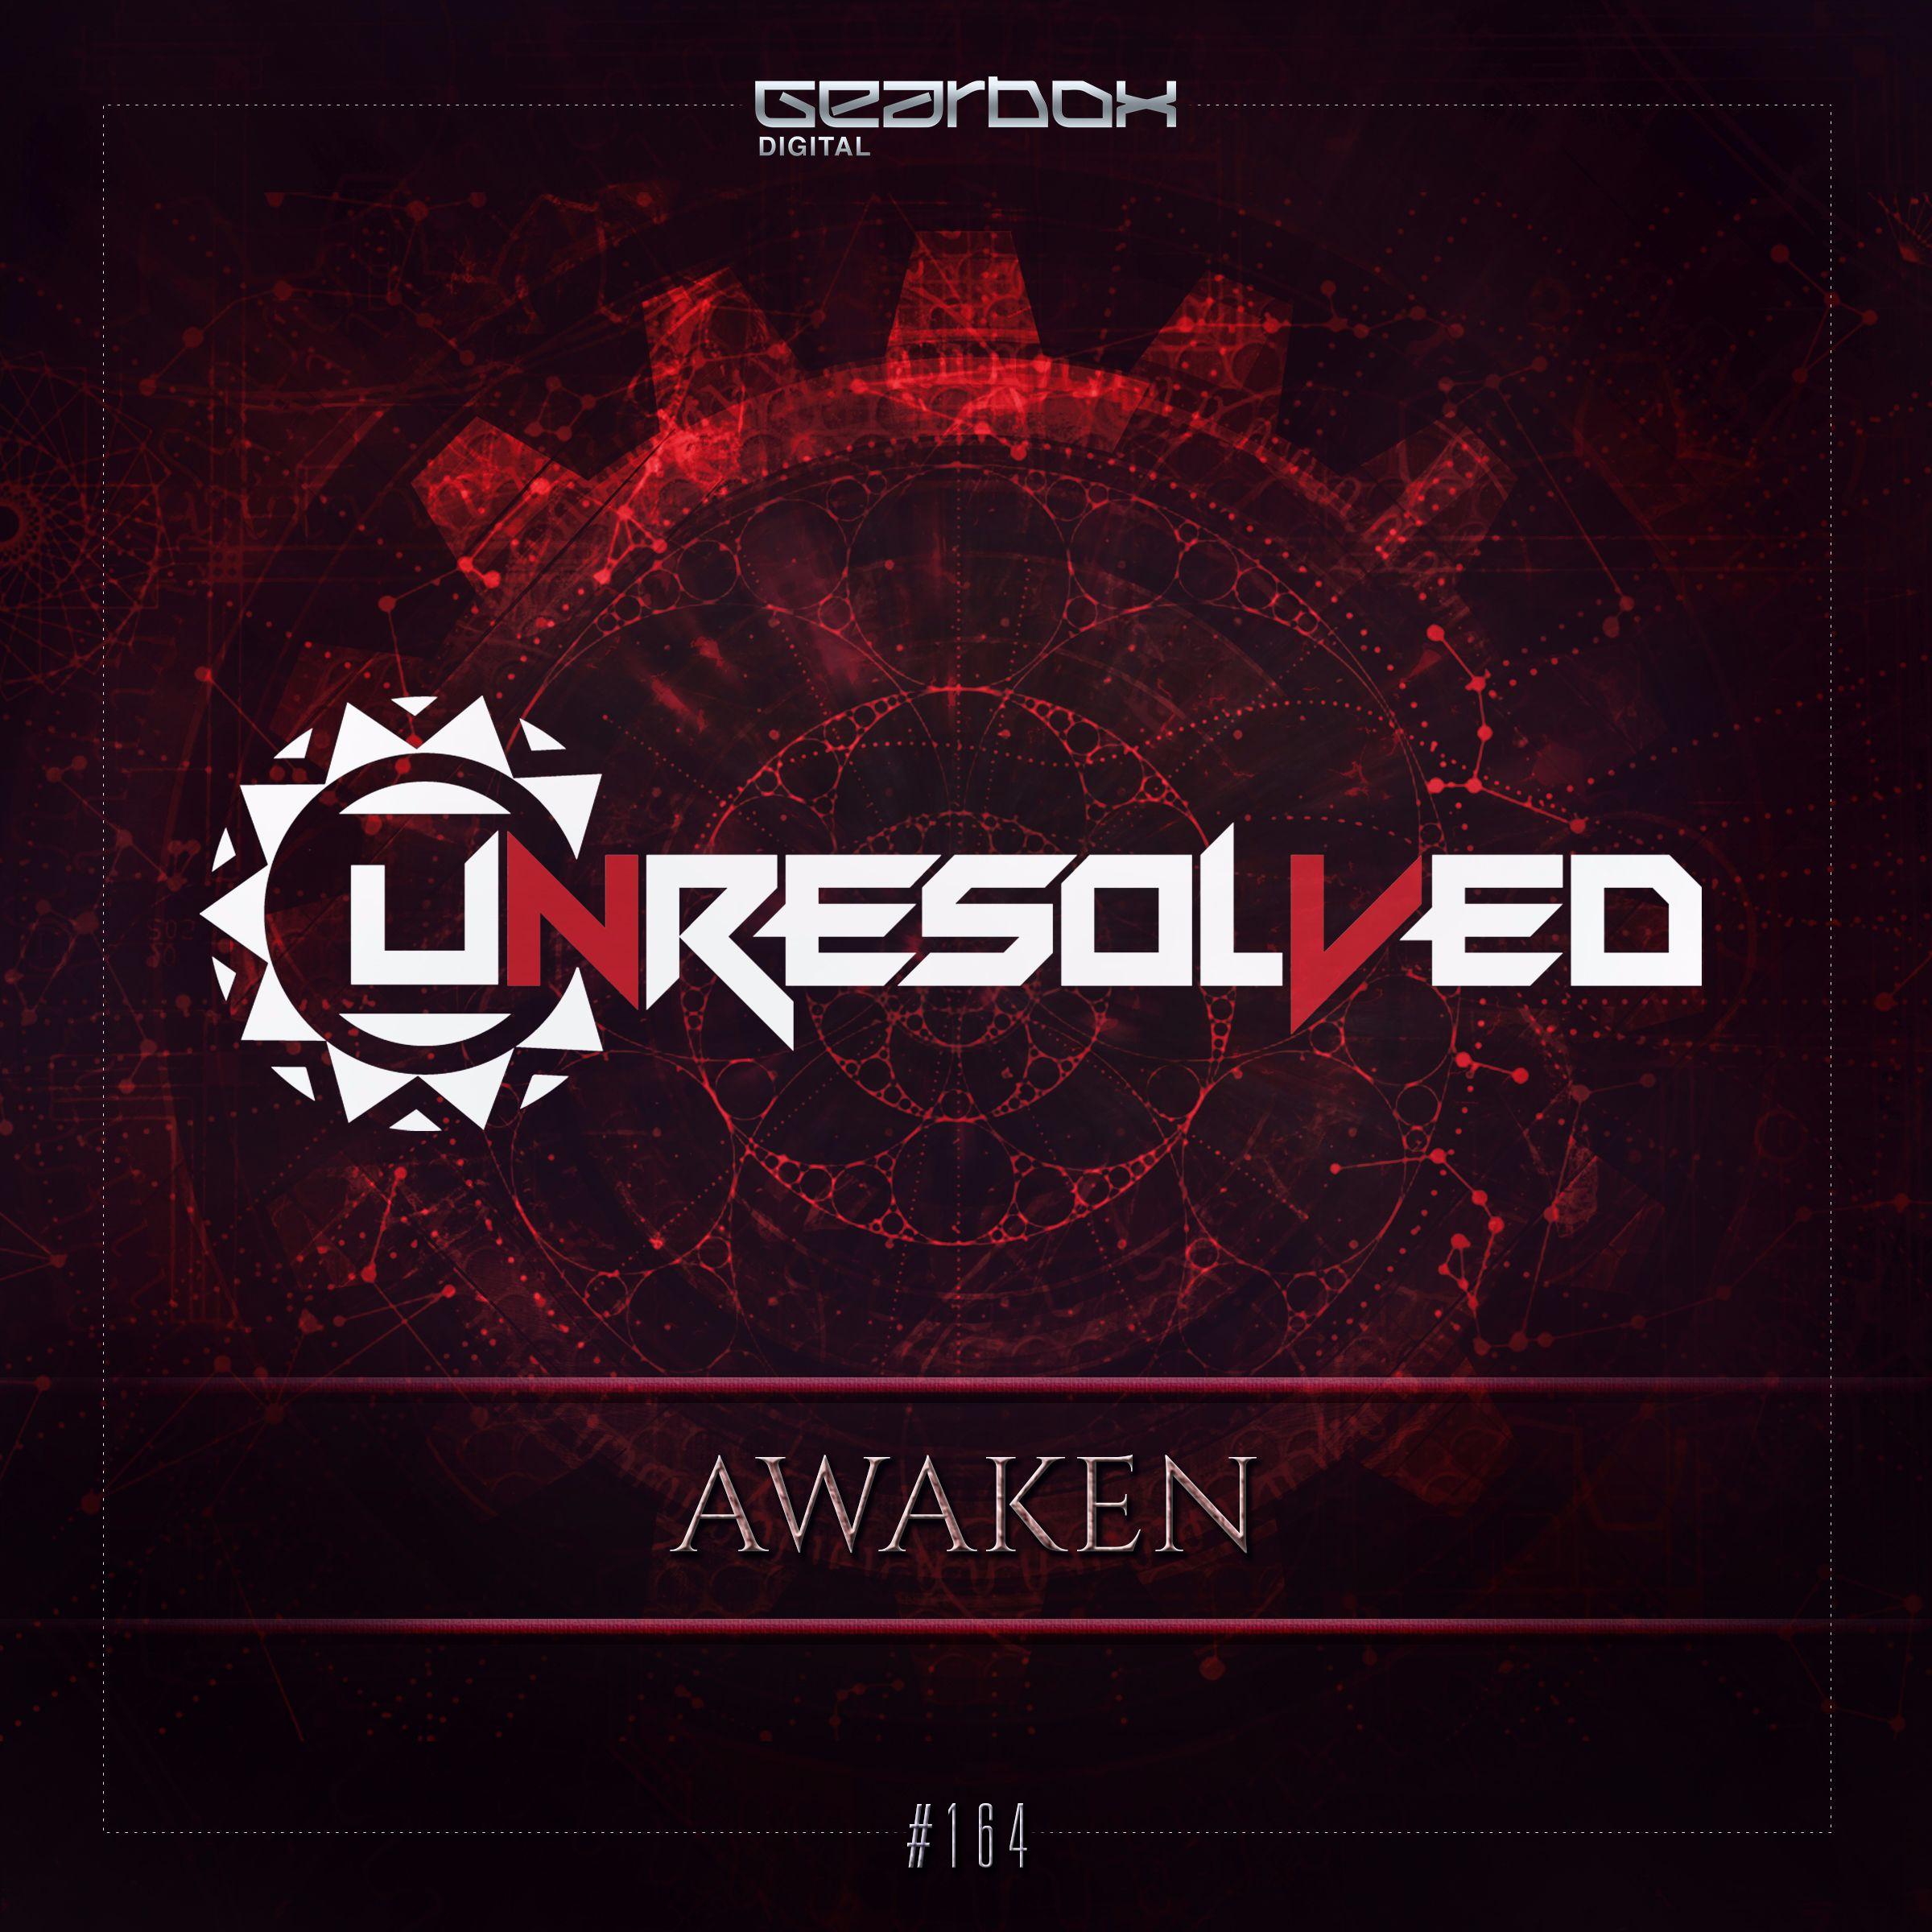 Unresolved - Awaken EP [GEARBOX DIGITAL] GBD164